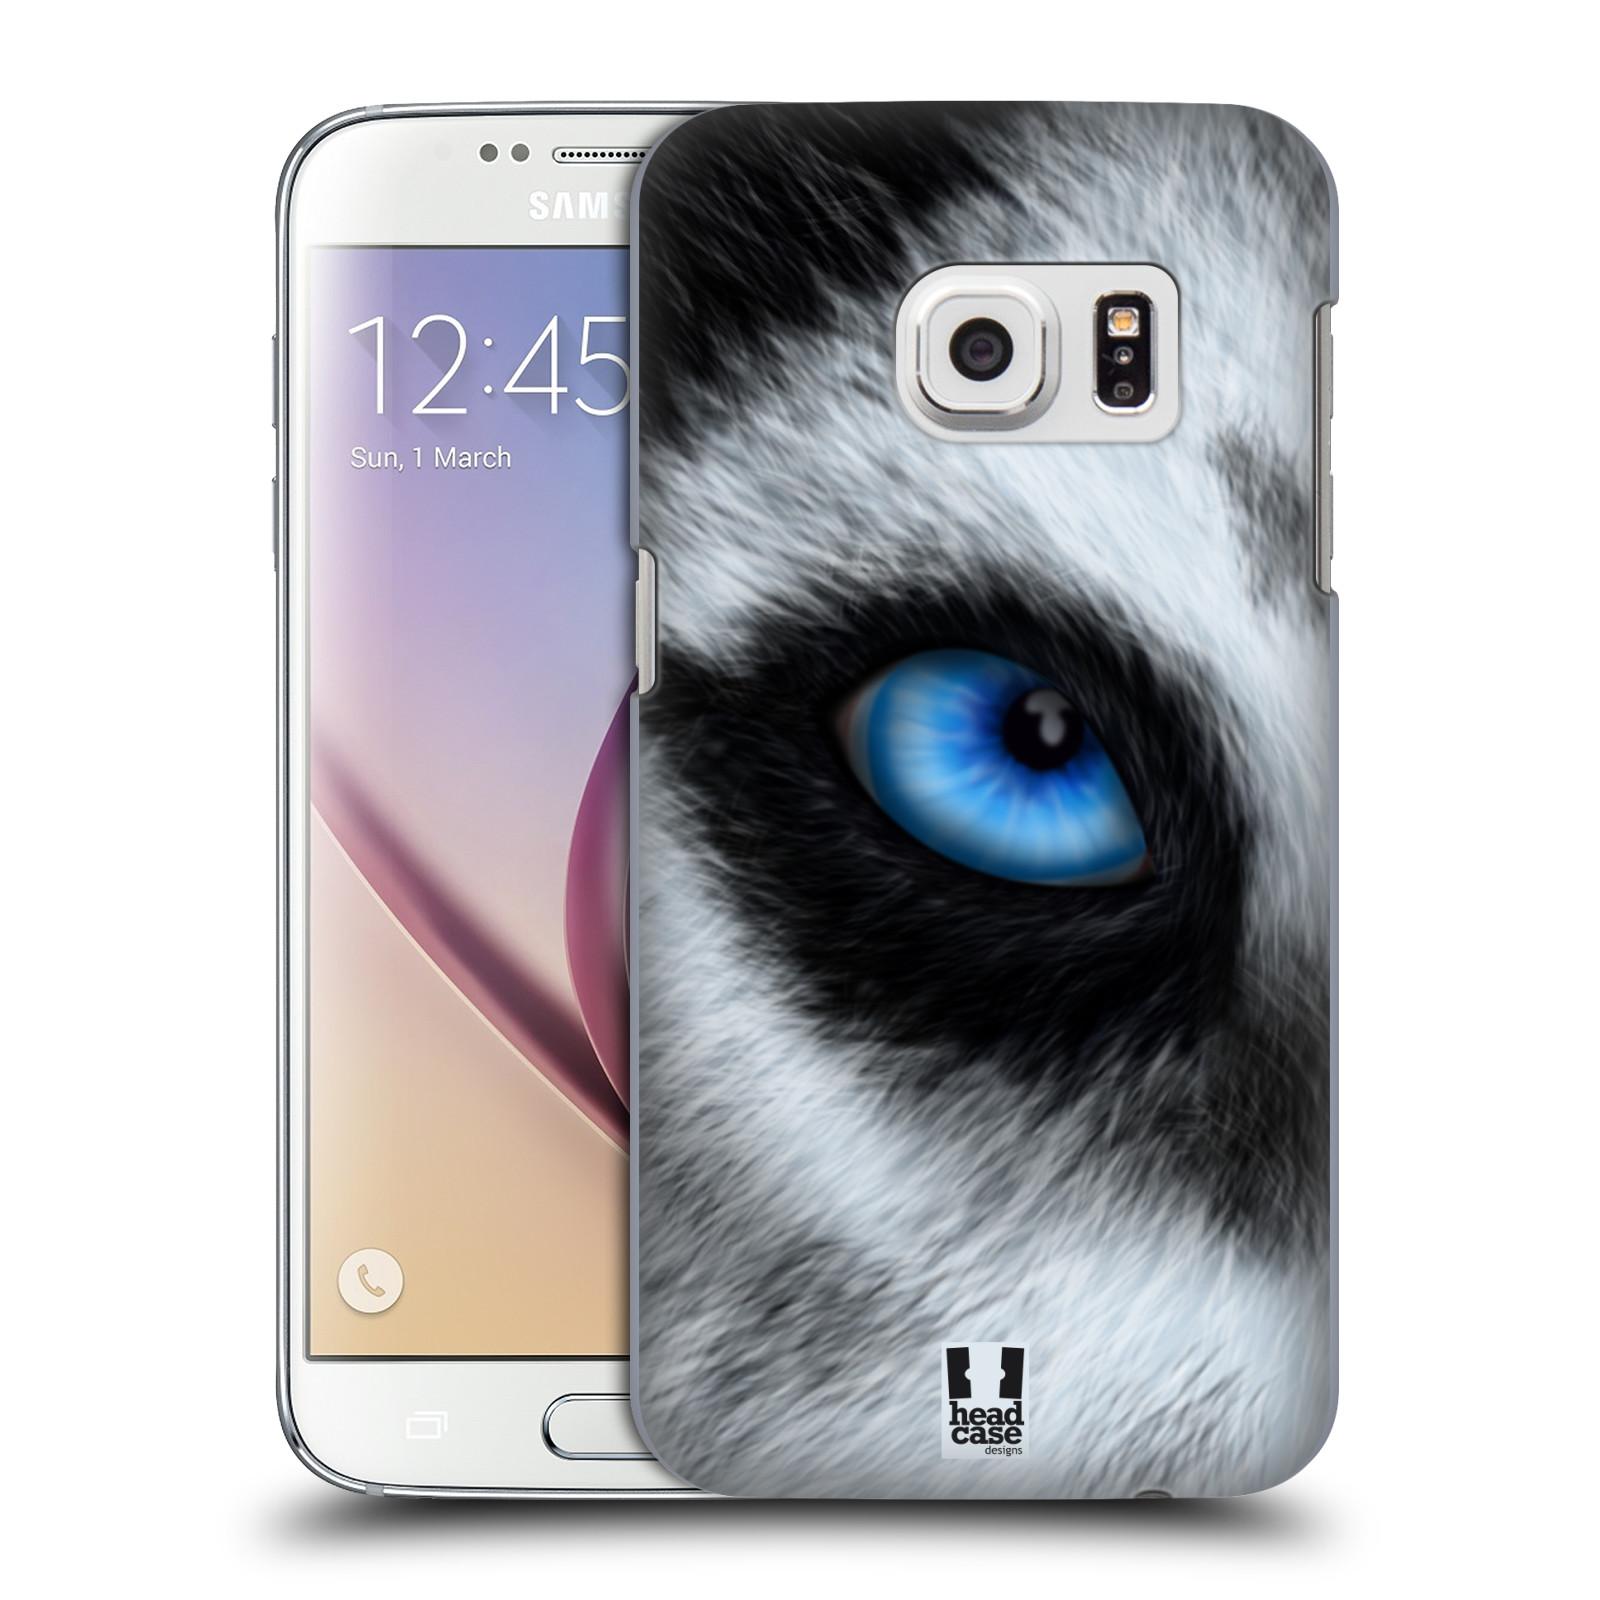 HEAD CASE plastový obal na mobil SAMSUNG GALAXY S7 vzor pohled zvířete oko pes husky